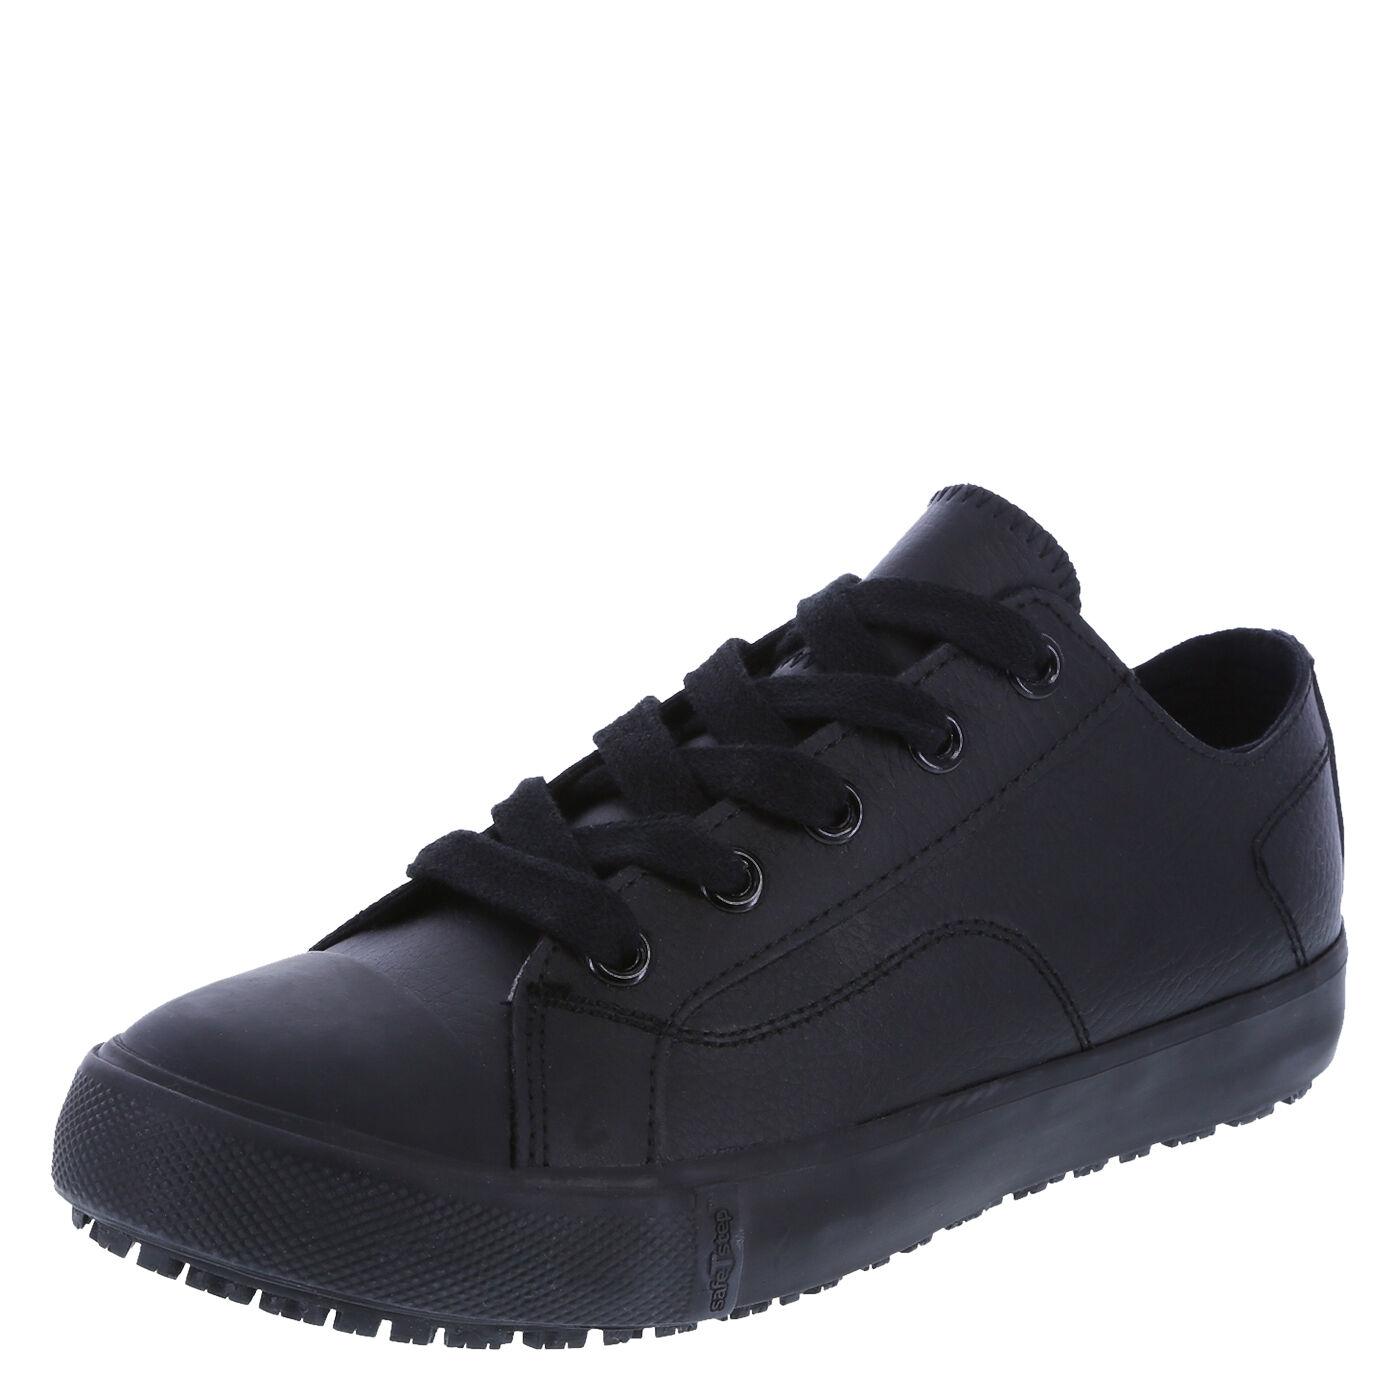 SafeTstep Women's Slip Resistant Kick Shoes